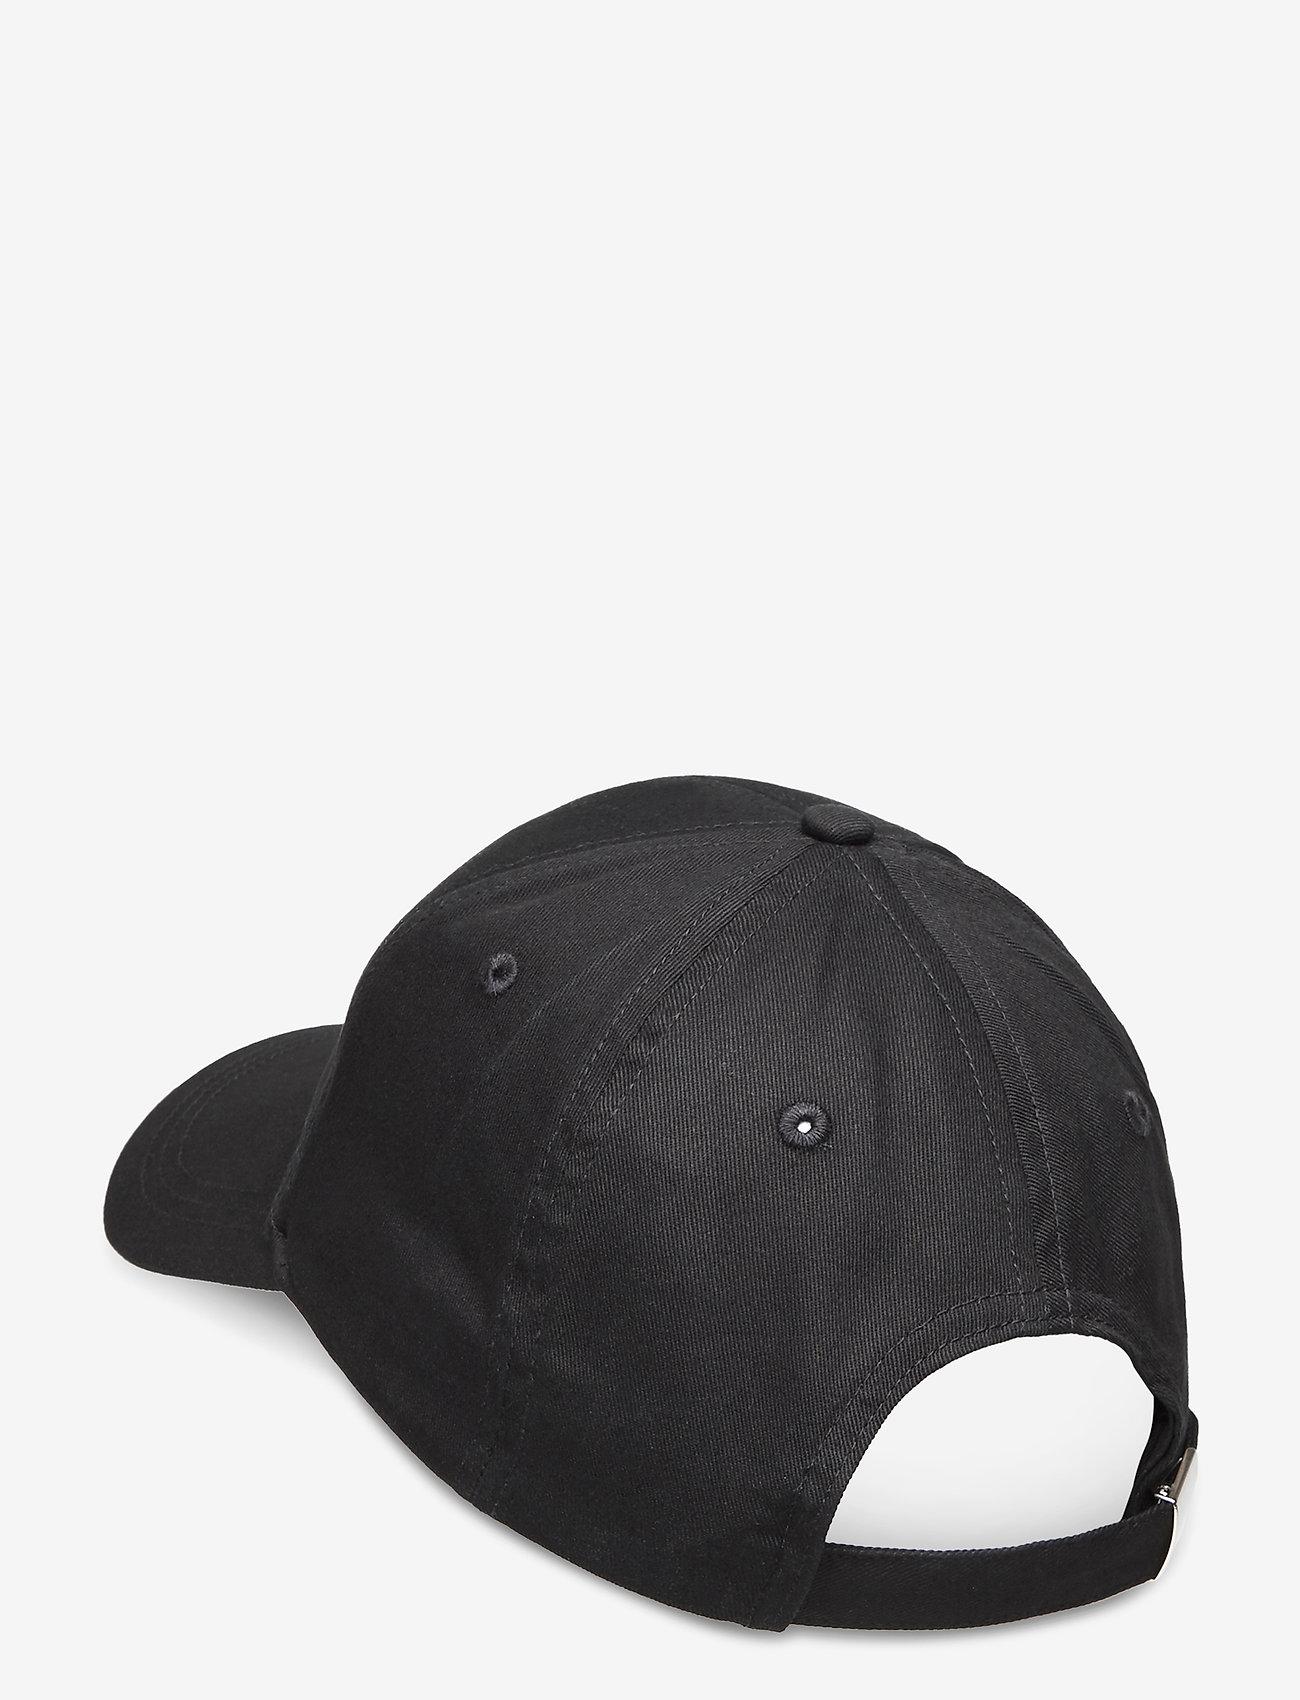 Calvin Klein Ck Tpu Bb Cap - Bonnets & Casquettes Black